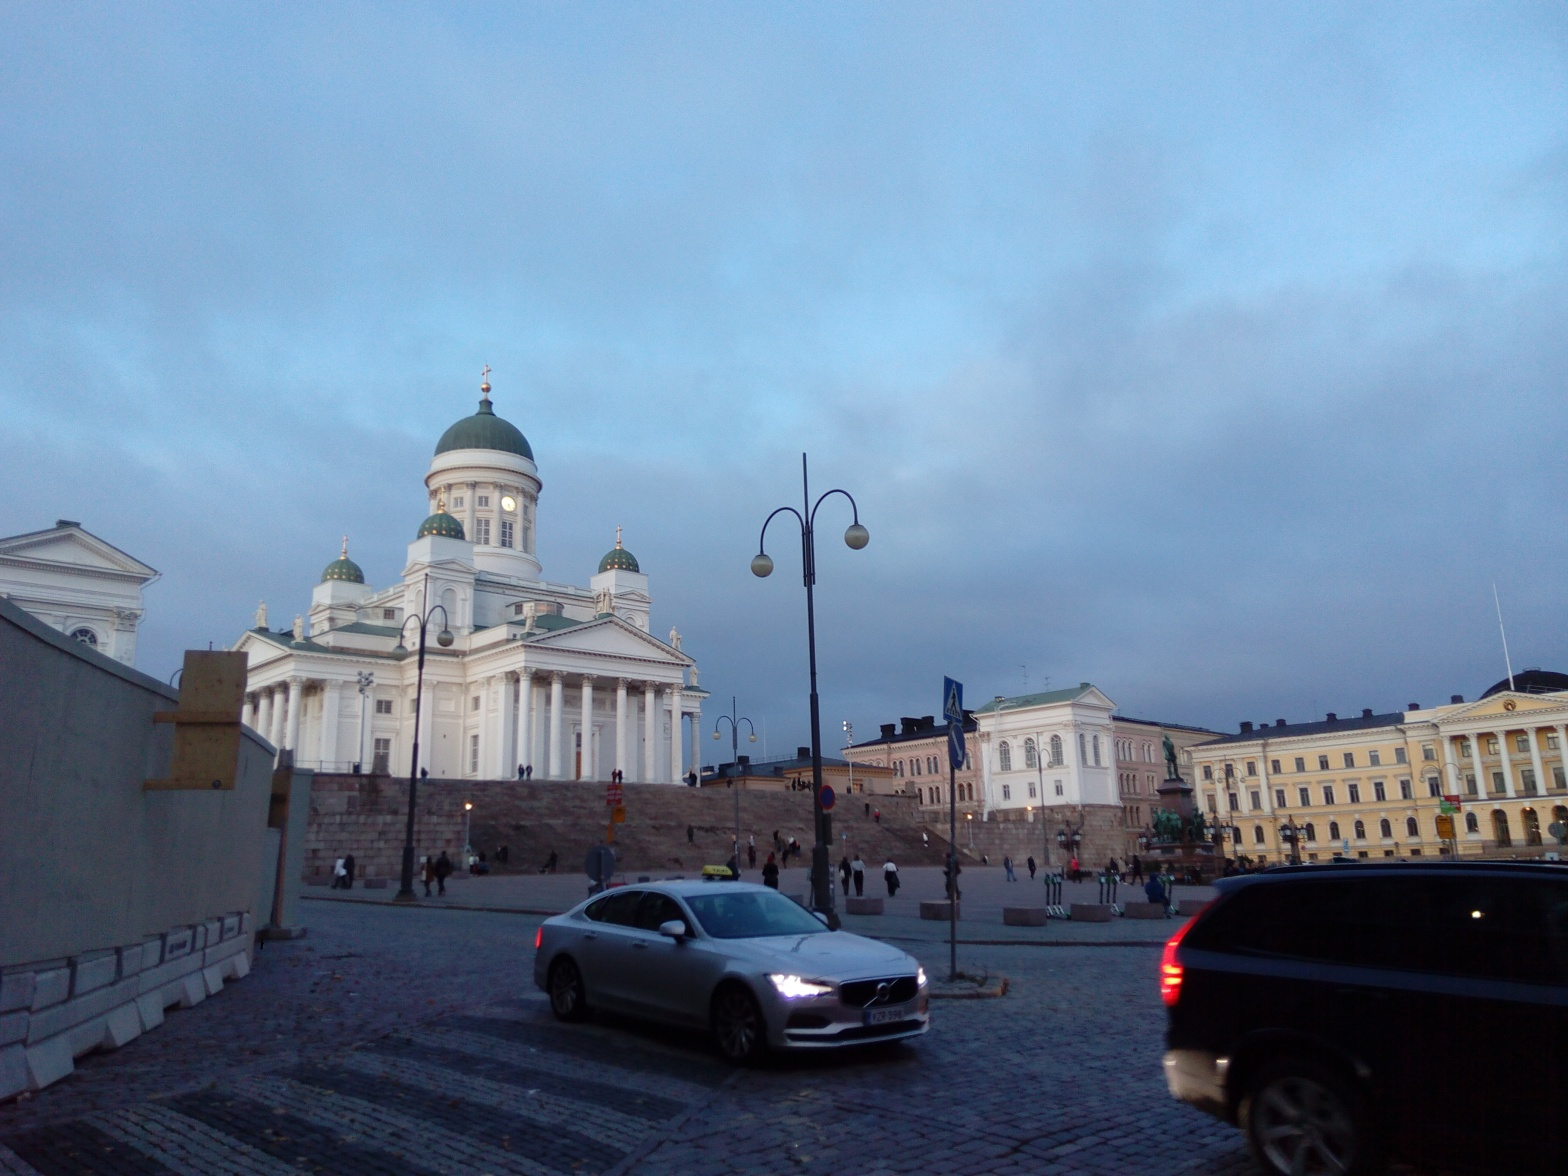 Helsinki 12th Oct 2019